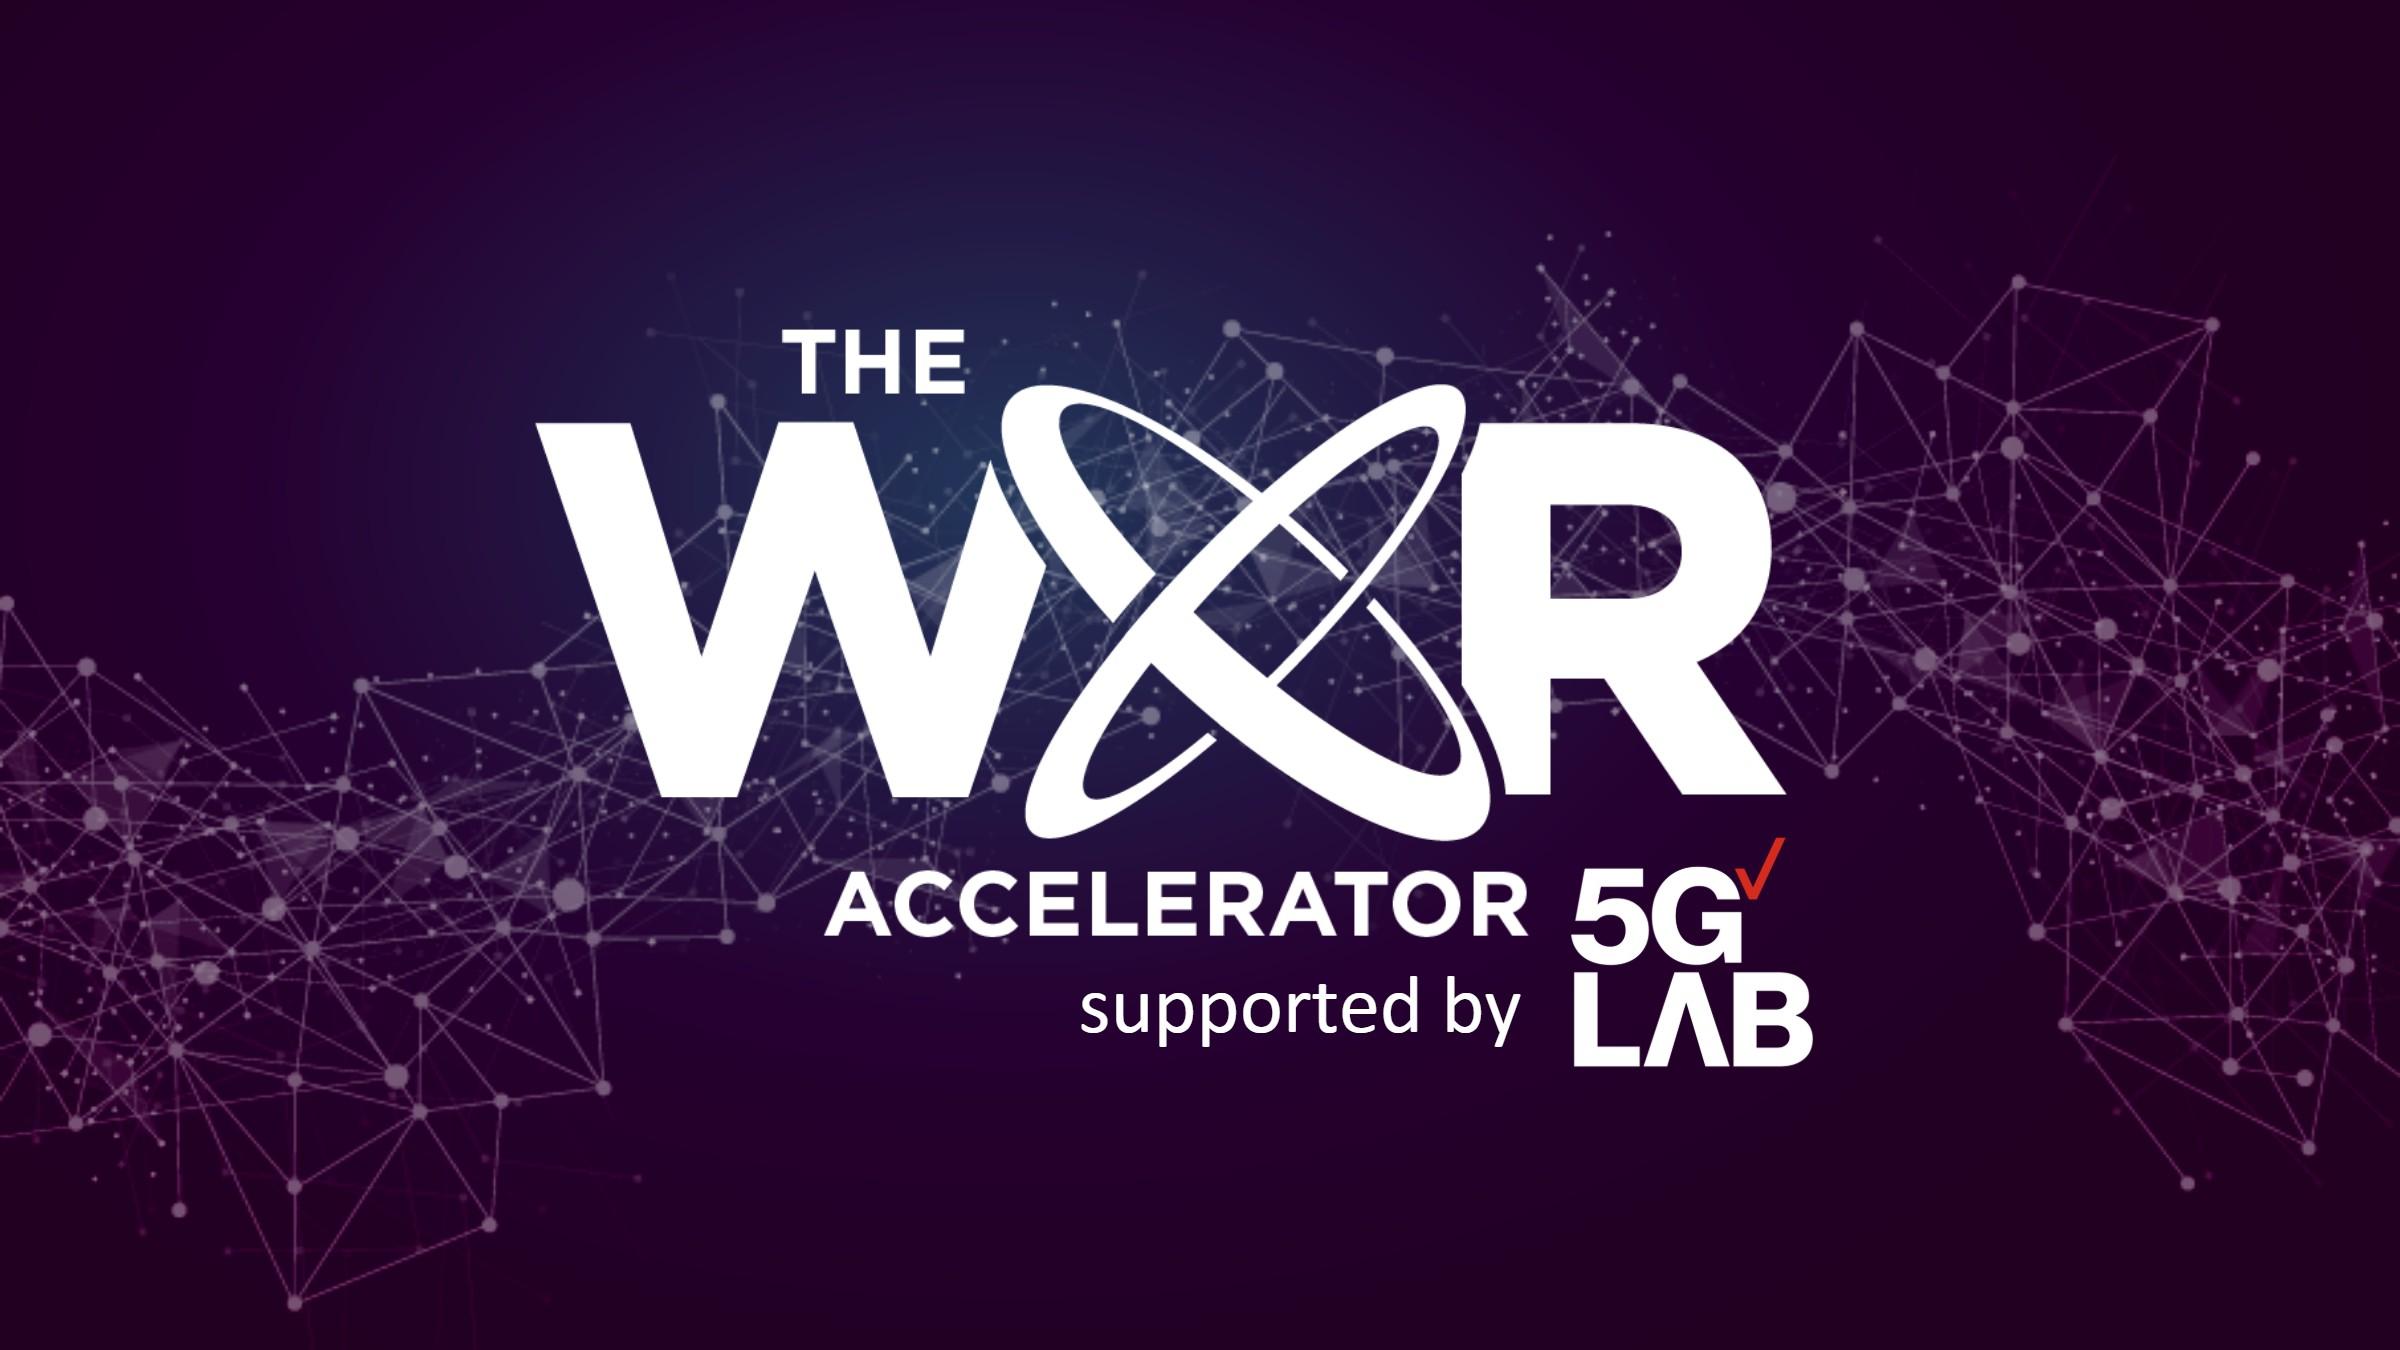 WXR-Accelerator-Spatial-Computing-Women-In-XR-Twitter-XR-VR-AR-MR.jpg